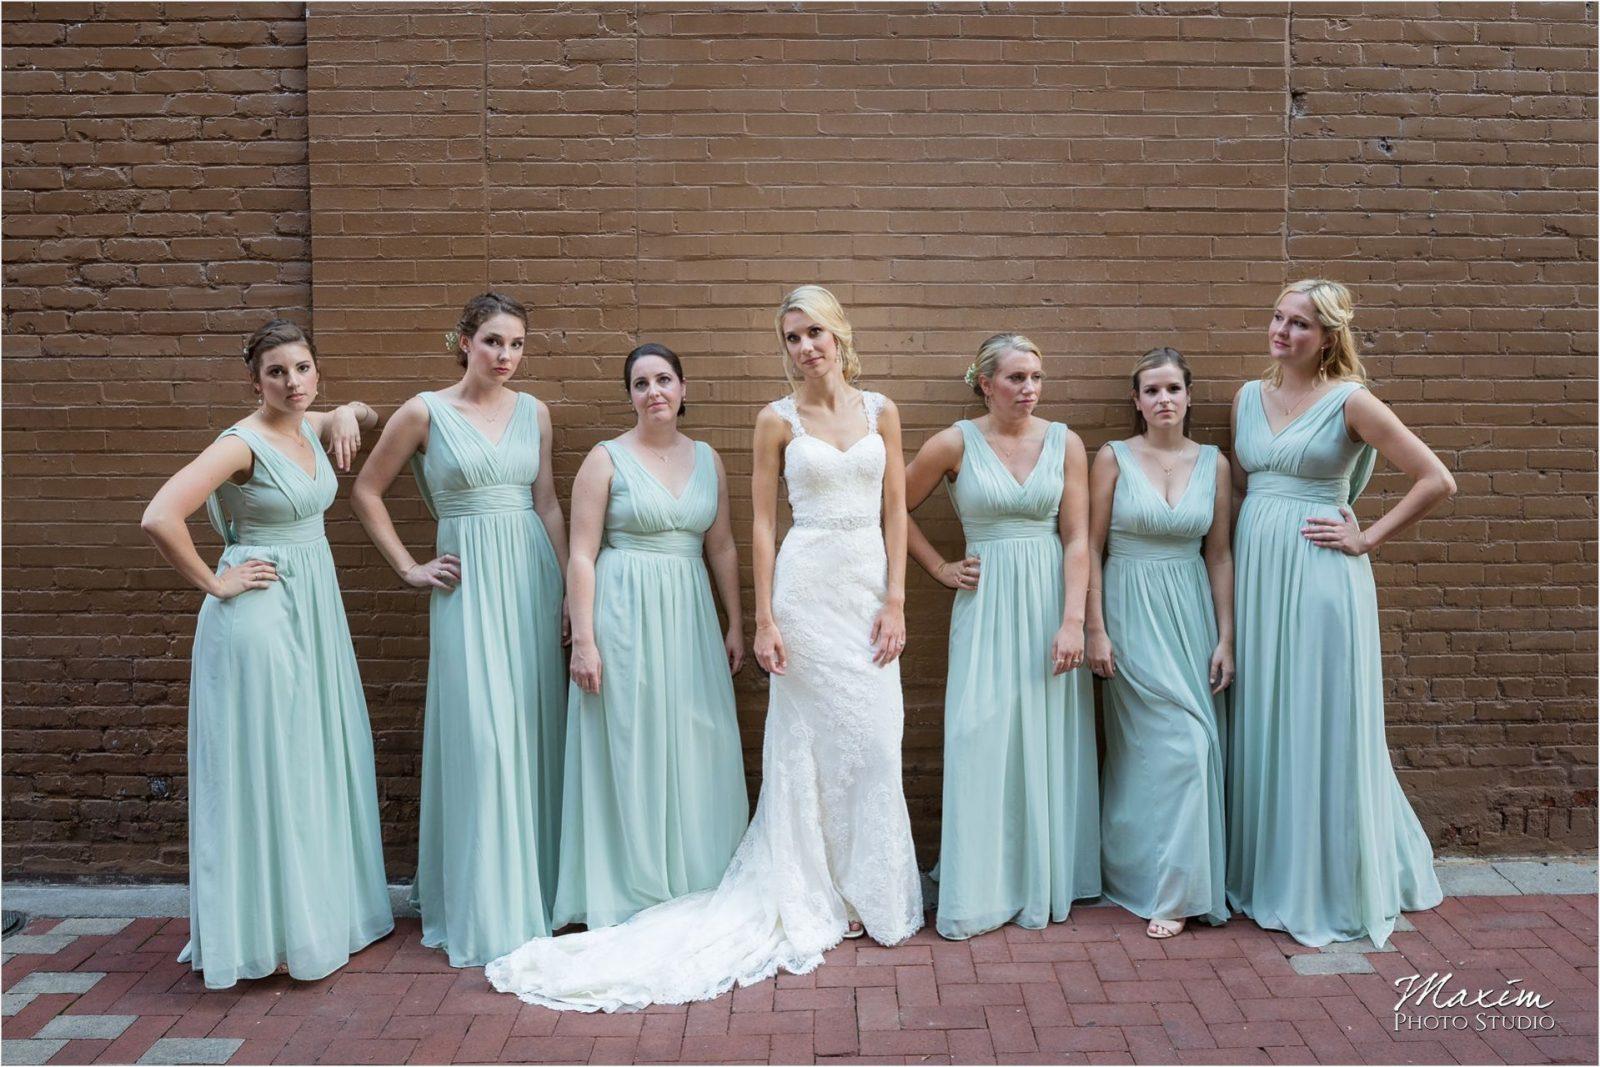 21C Museum Cincinnati Hotel Bride Pictrues